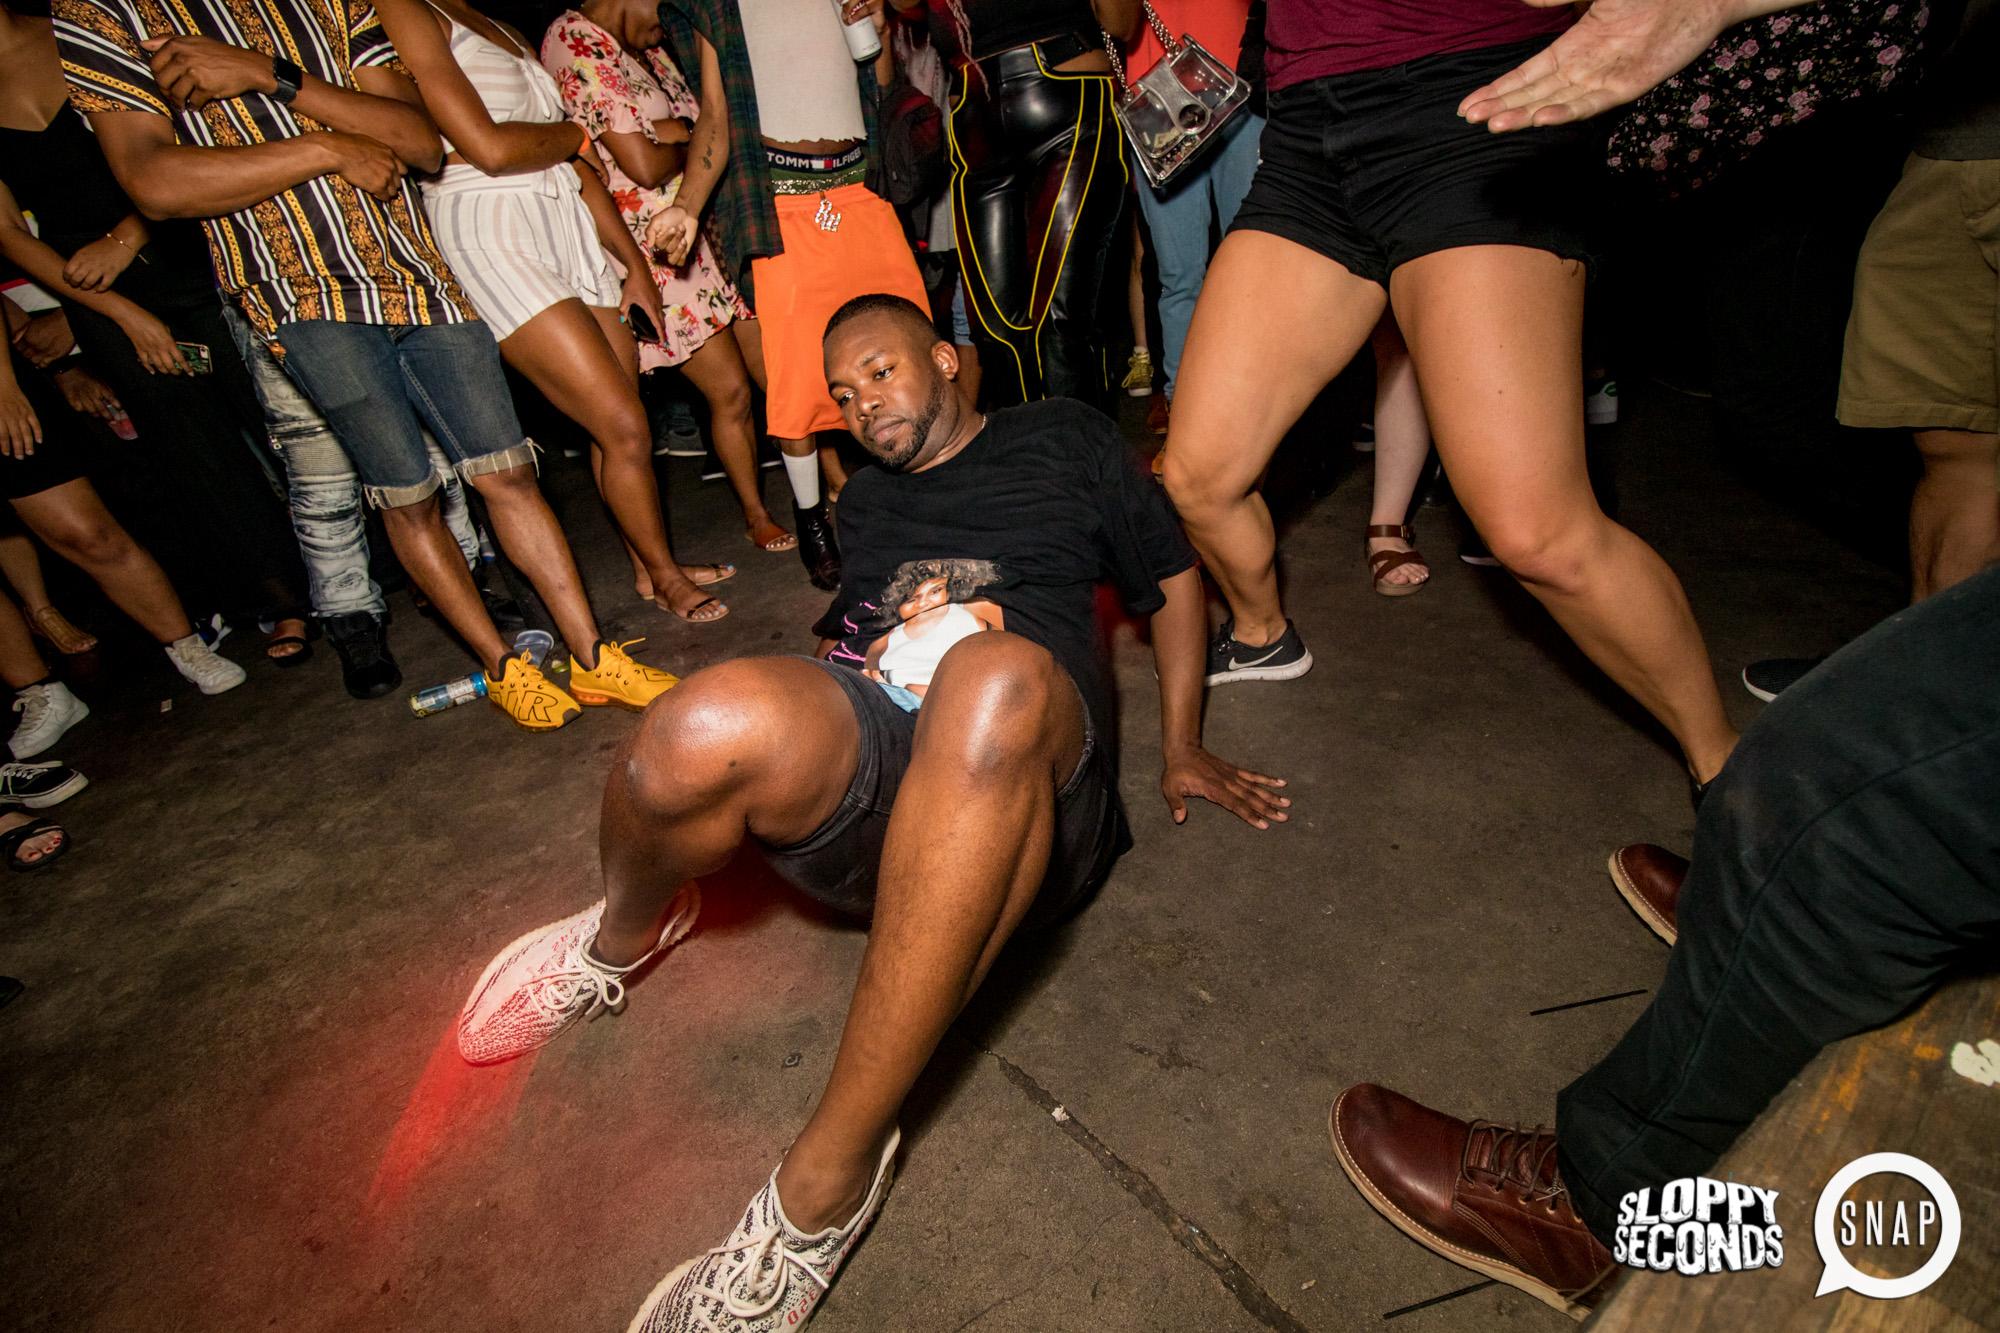 65Sloppy Seconds MJQ Atlanta Grace Kelly Oh Snap Kid.jpg